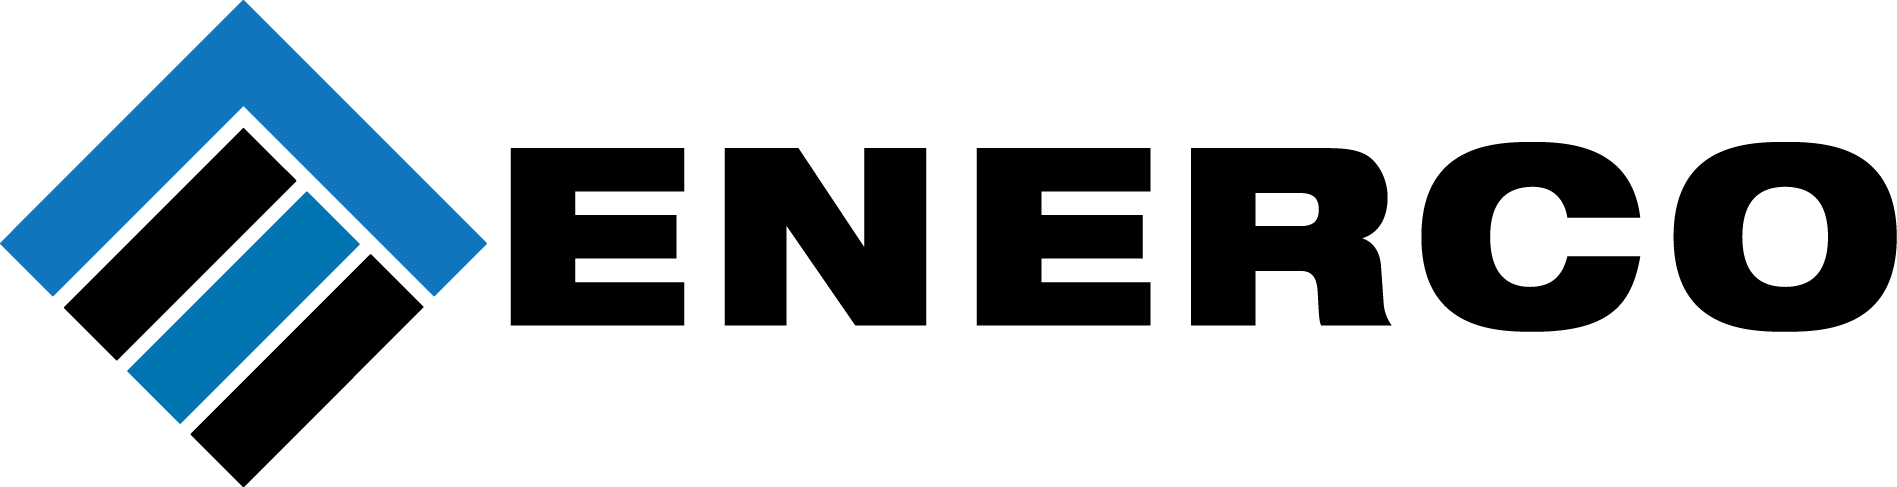 Horizontal Propane Two Stage Regulator  Clamshell